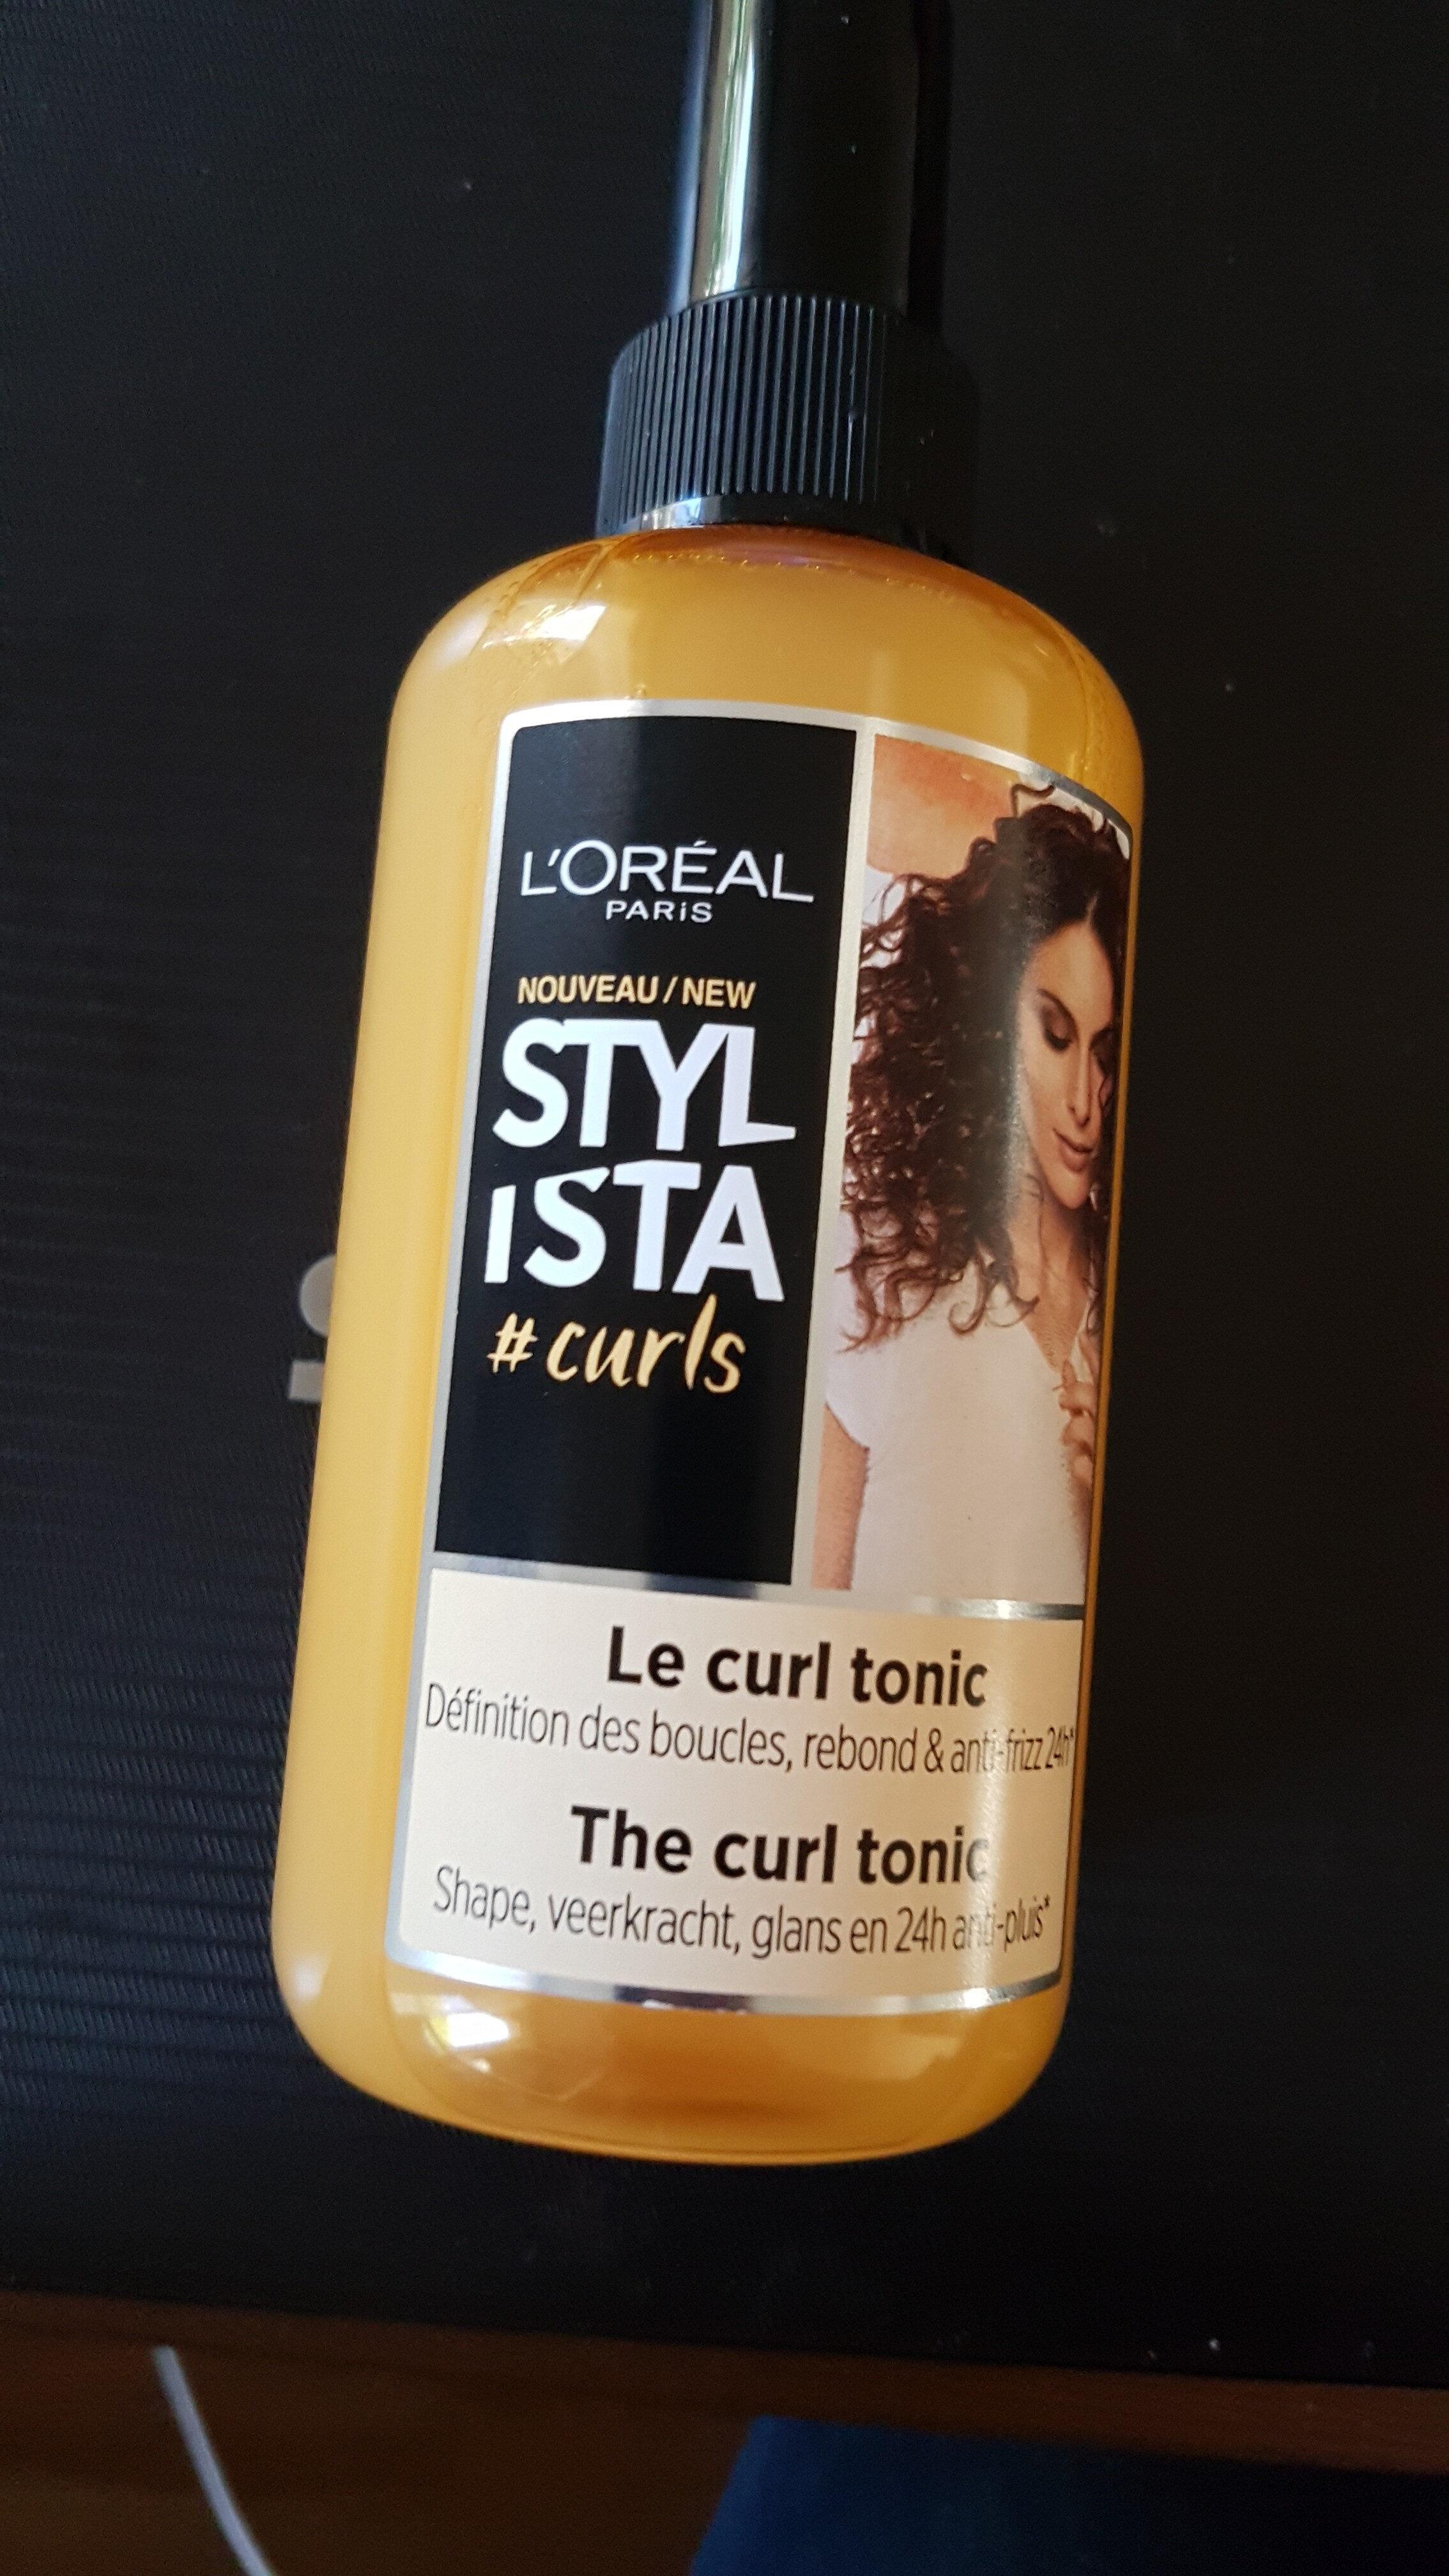 styl ista curls - Product - fr